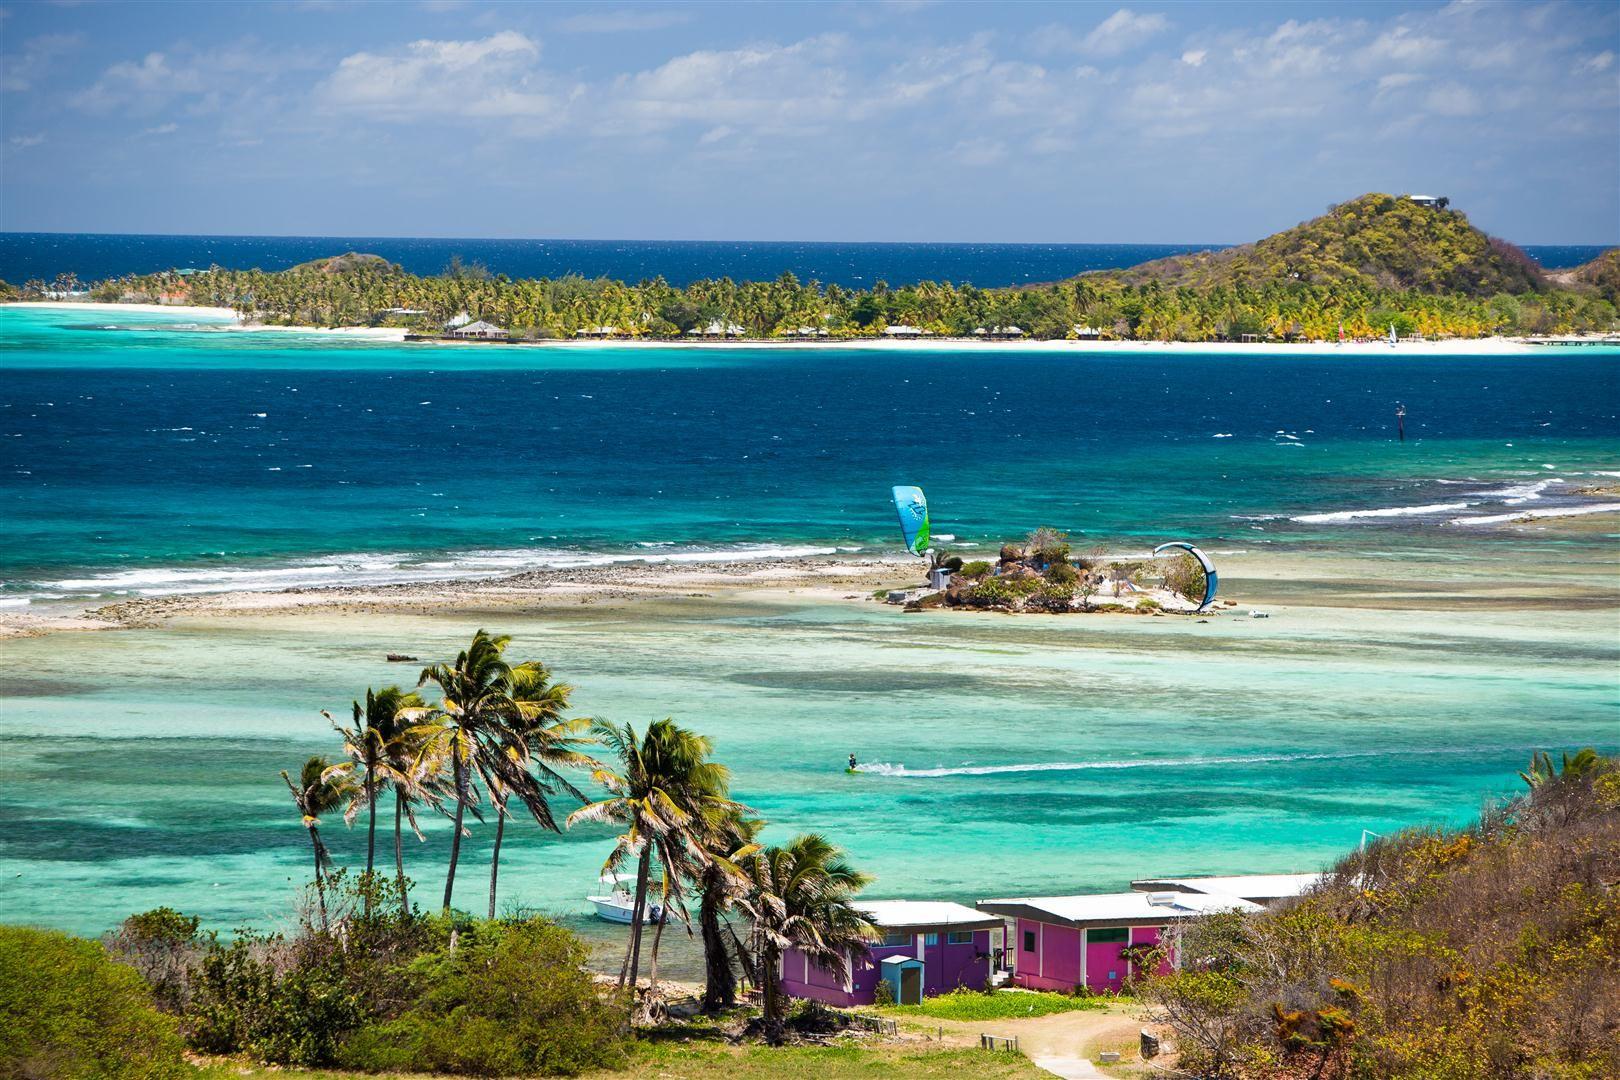 Gallery Kite Surfing Palm Island Island